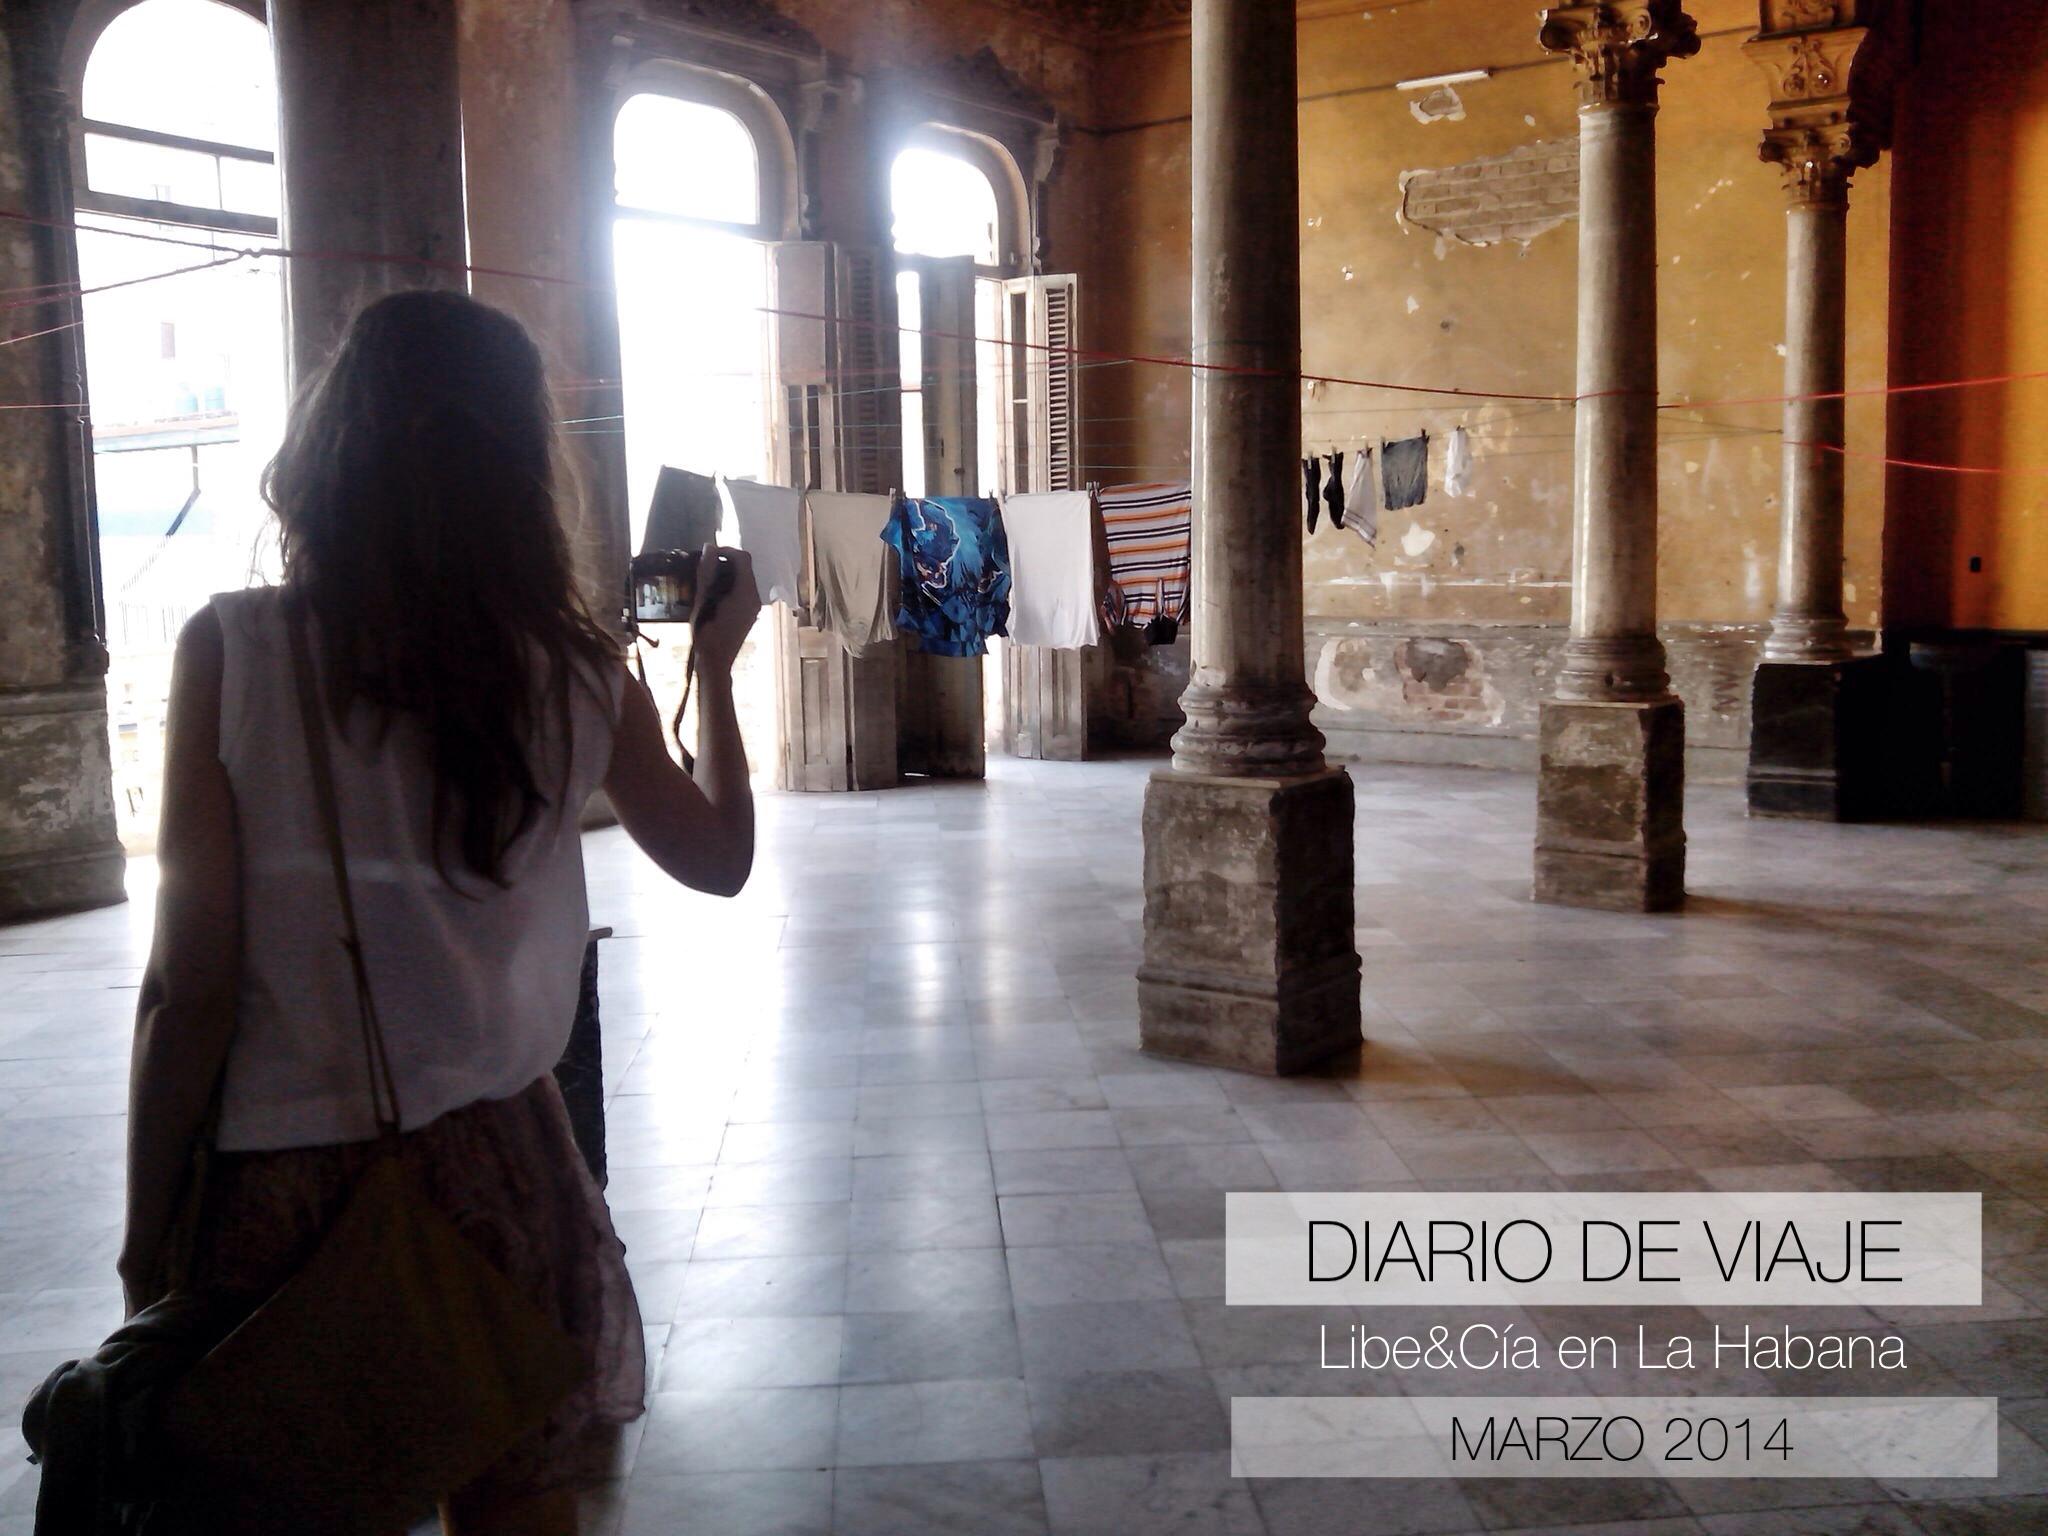 reharq_la-habana_jornadas_arquitectura vernacula_diario de viajea